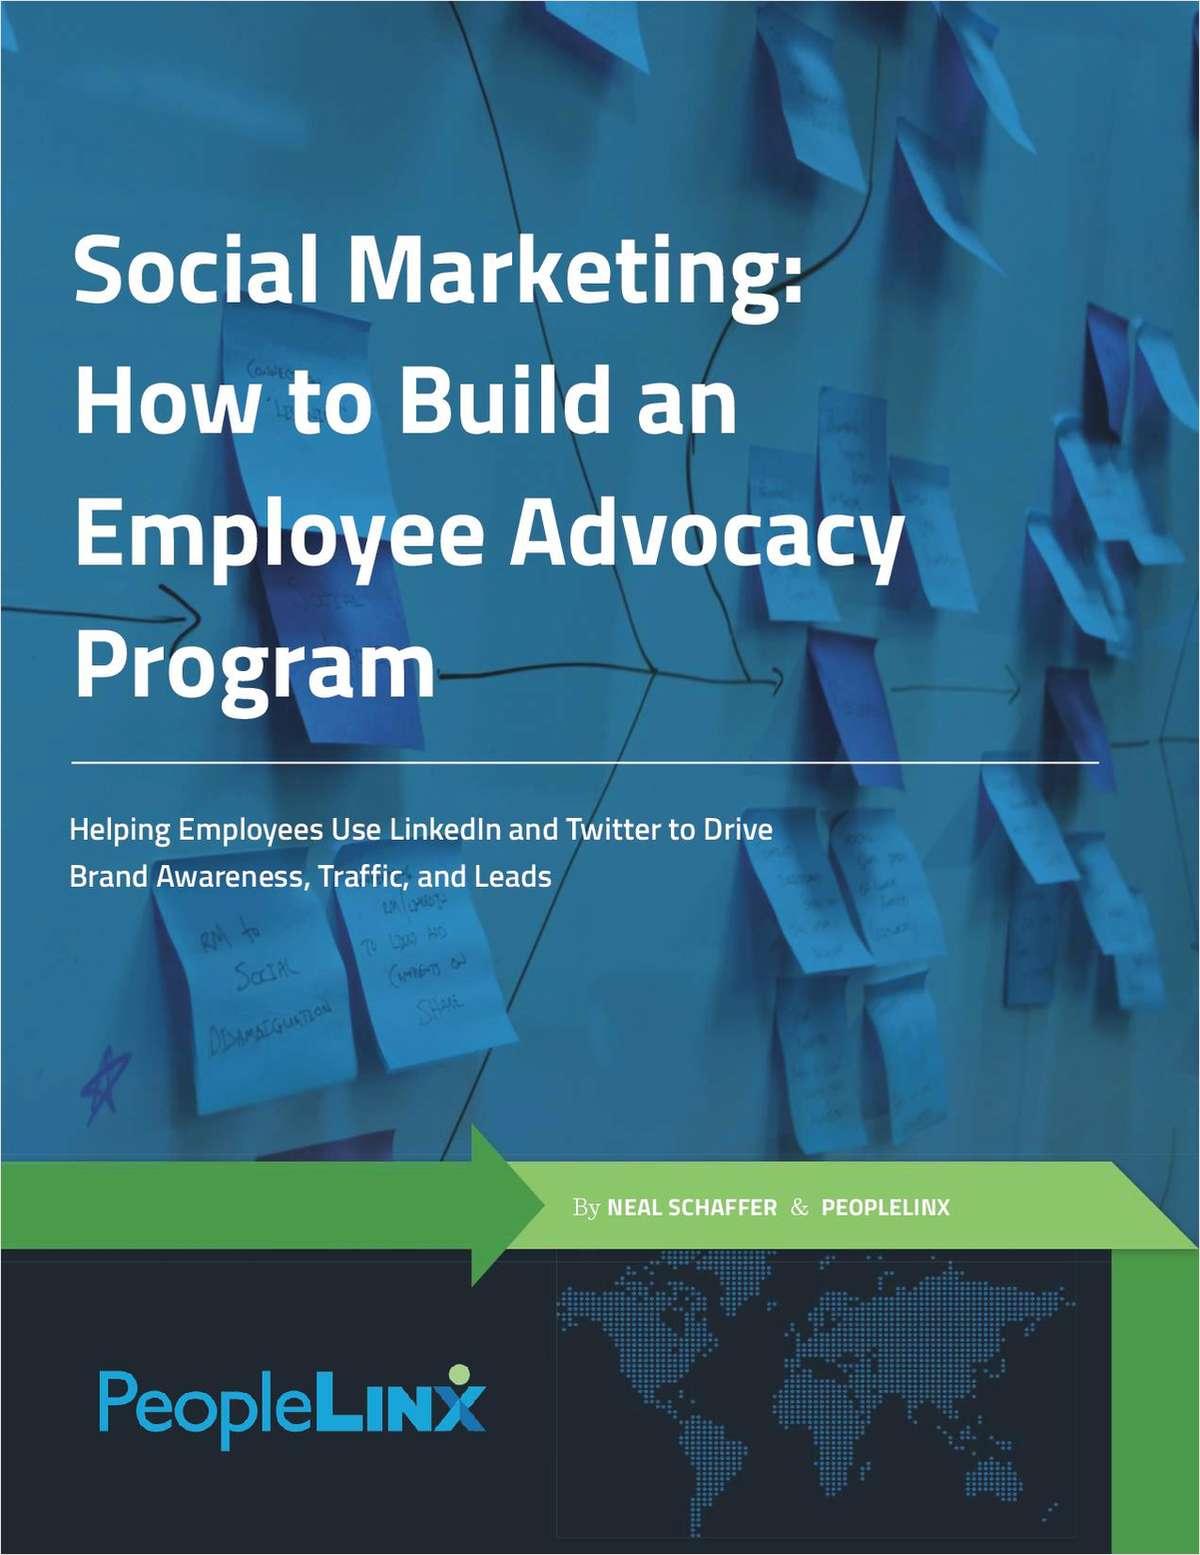 Social Marketing: How to Build an Employee Advocacy Program